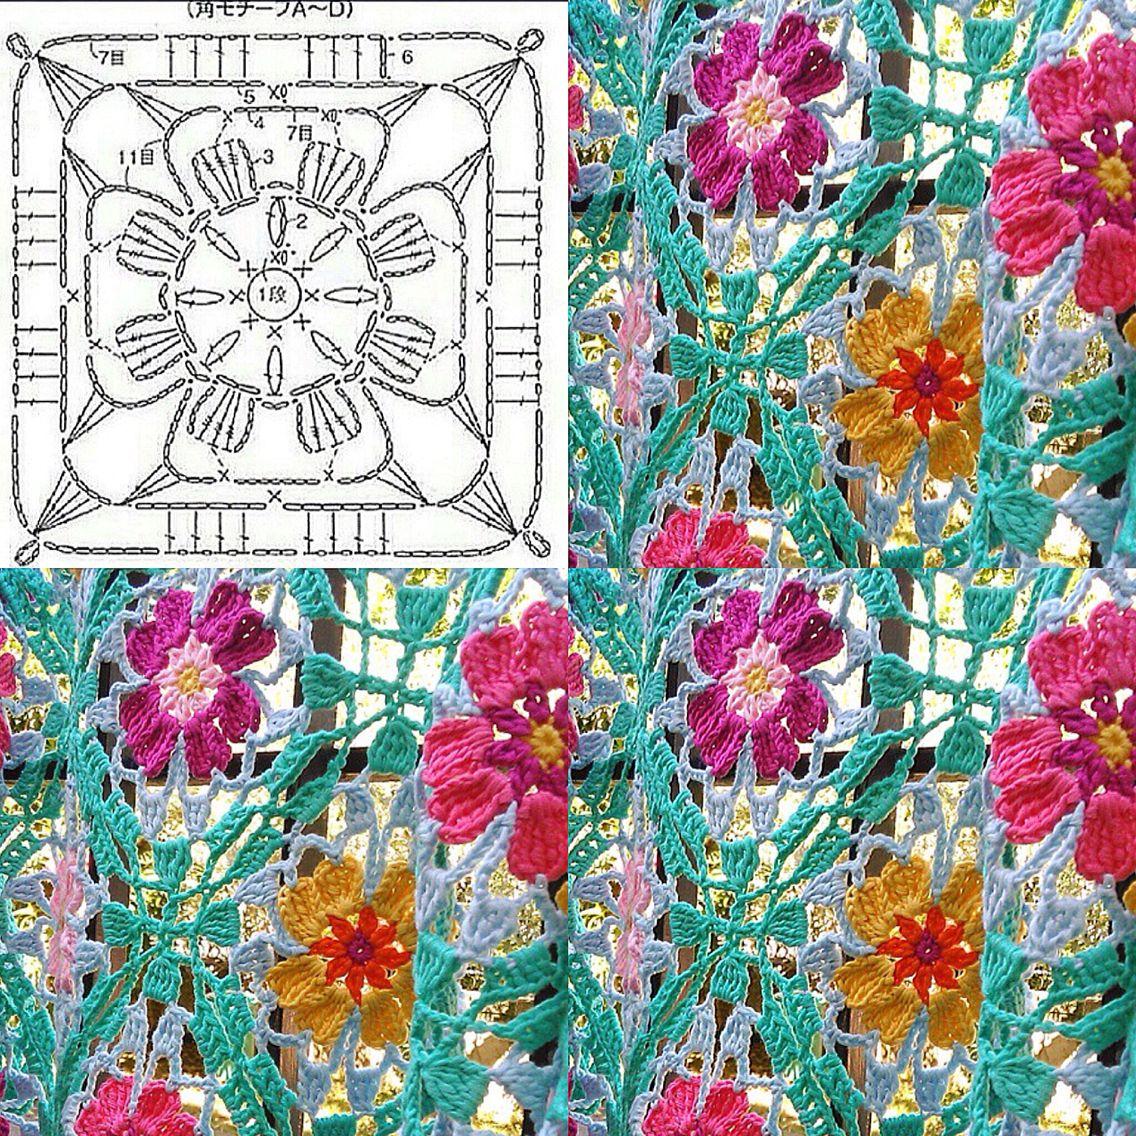 For The Amazing Japanese Crochet Flower Shawl From Instagram Here Rose Diagram Flowers 4 Is Pattern Hookchia Made It On Eresaestegui